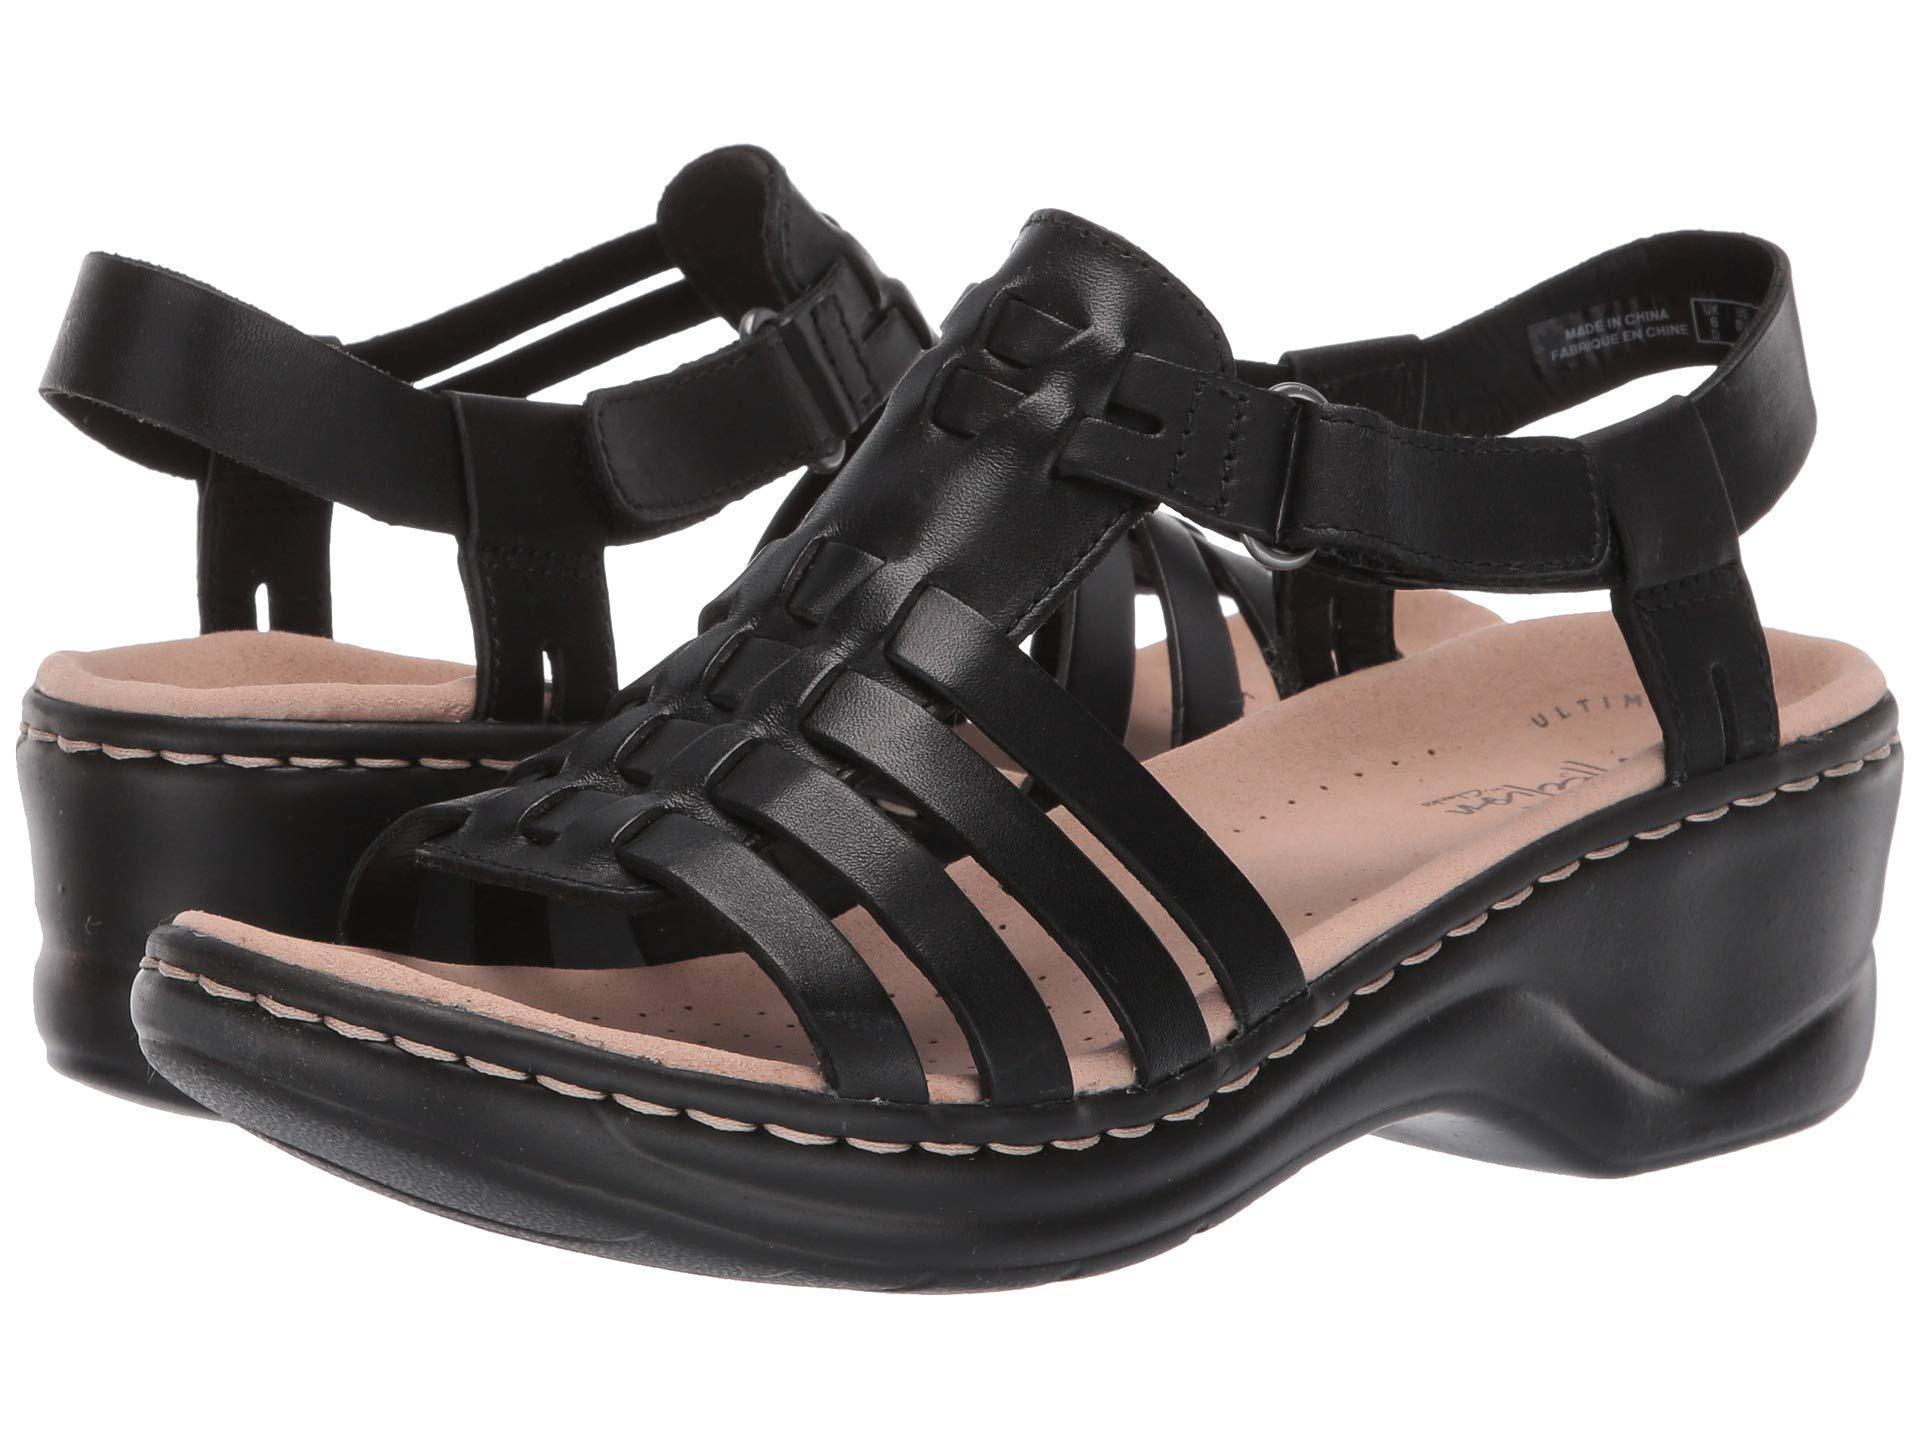 e7fa0f24ef2 Lyst - Clarks Lexi Bridge (tan Multi Leather) Women s Dress Sandals ...